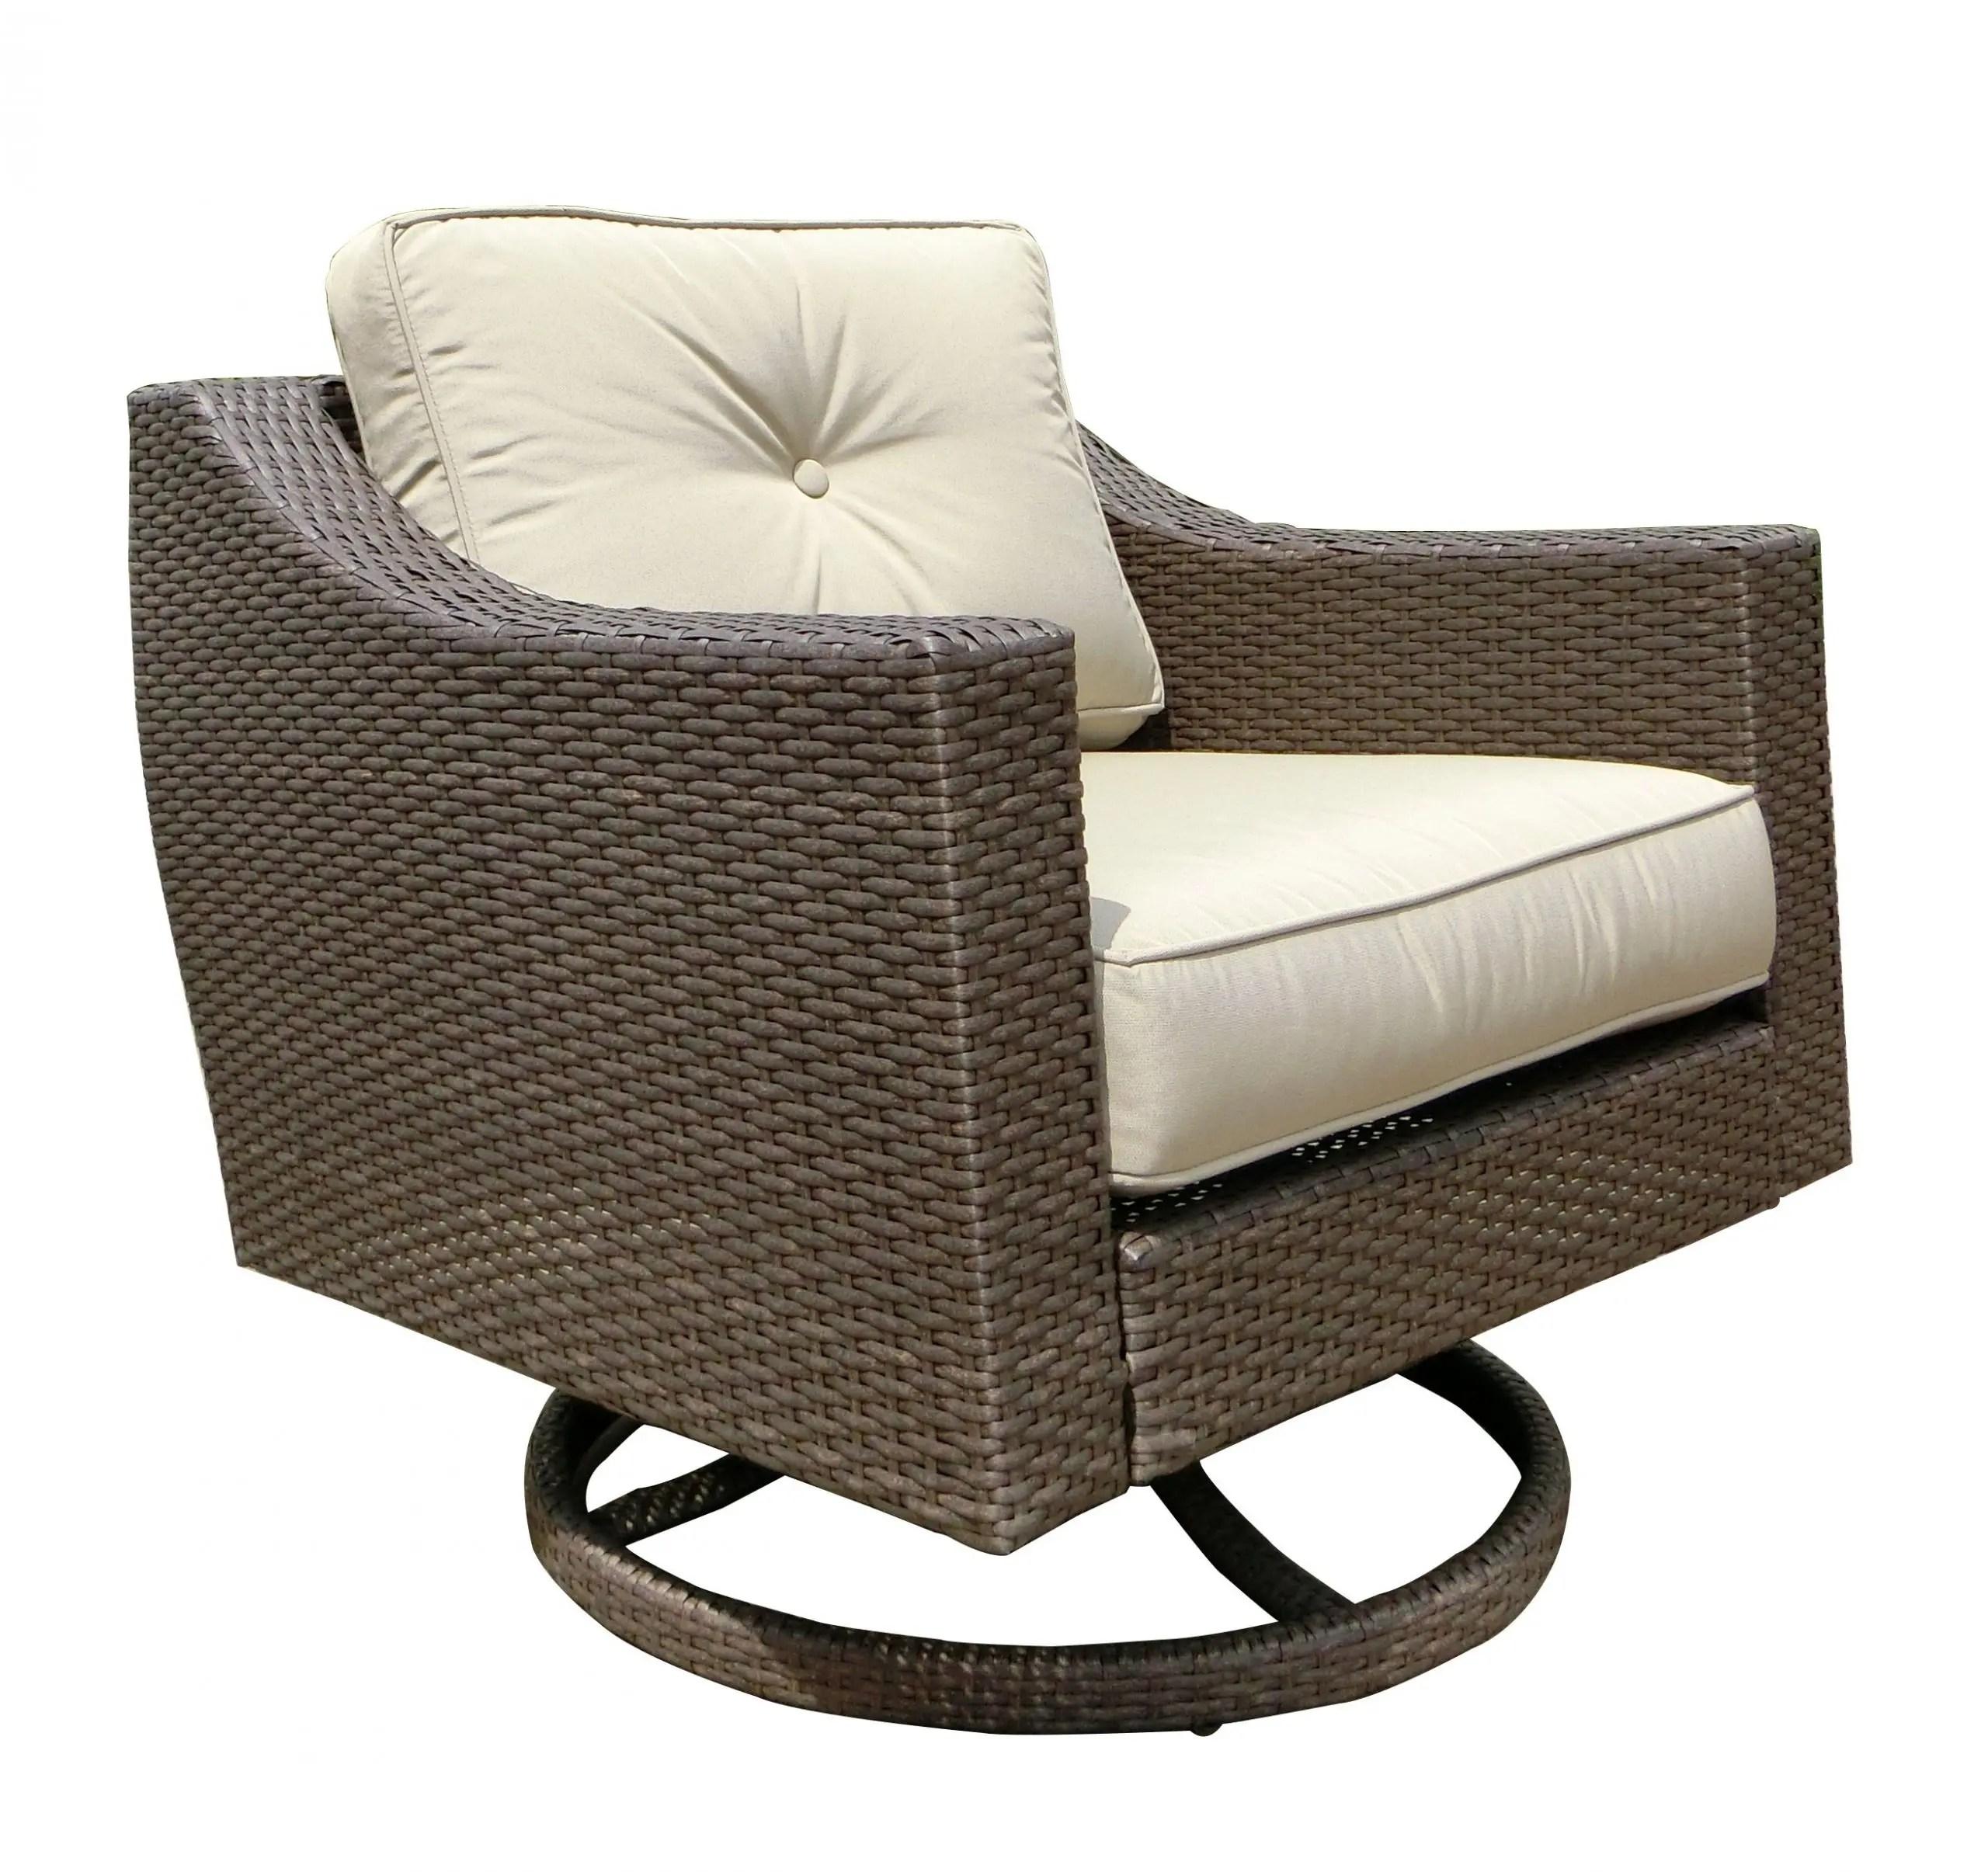 south beach club swivel rocker outdoor patio furniture wicker resin rattan